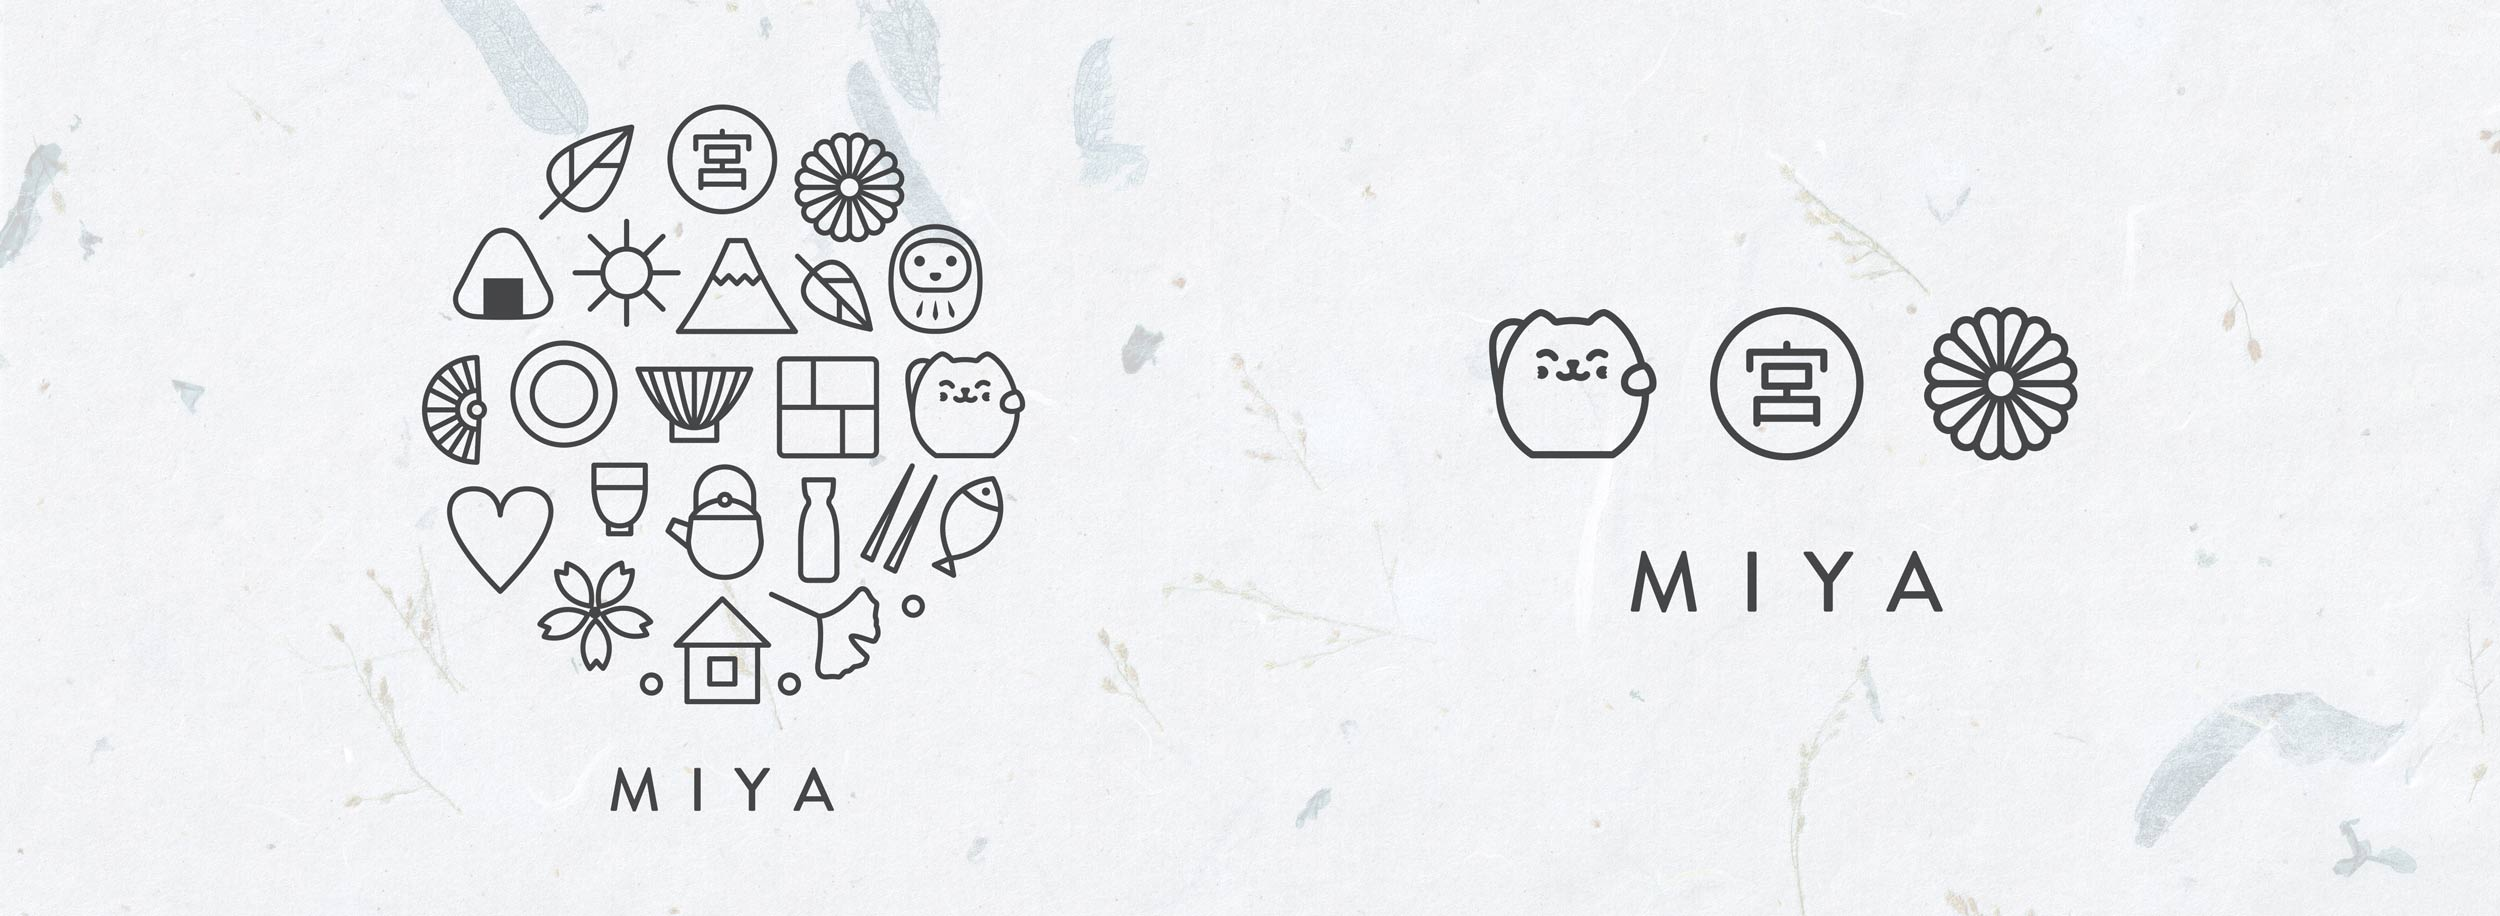 Miya logo: short and full version. © LET'S PANDA